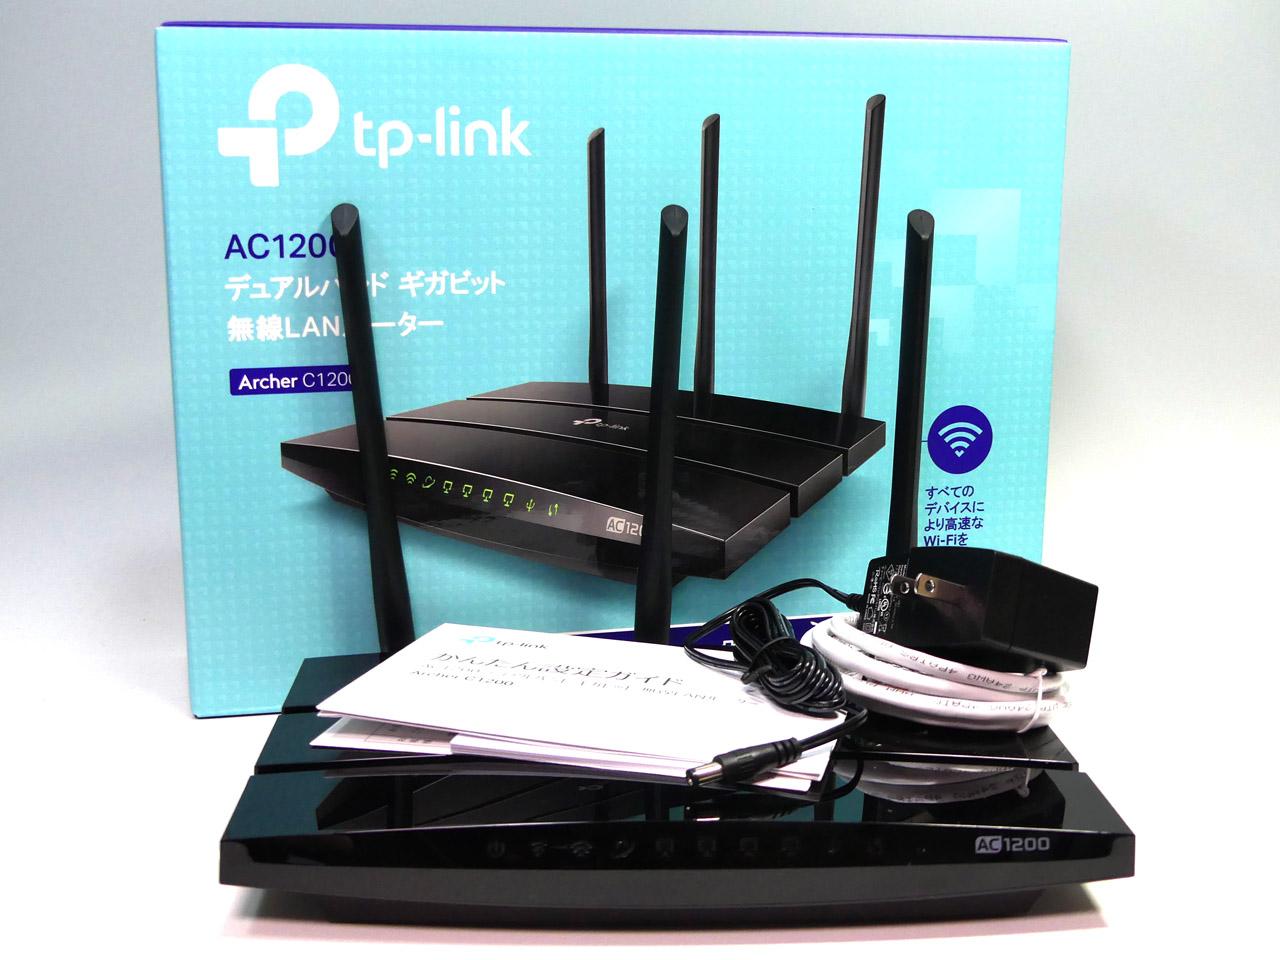 TP-Link Archer C1200。IEEE 802.11ac準拠で5GHz帯で最大867Mbps、2.4GHz帯で最大300Mbpsの通信に対応した無線LANルーター。PPTPとOpenVPNのVPNサーバー機能を搭載する